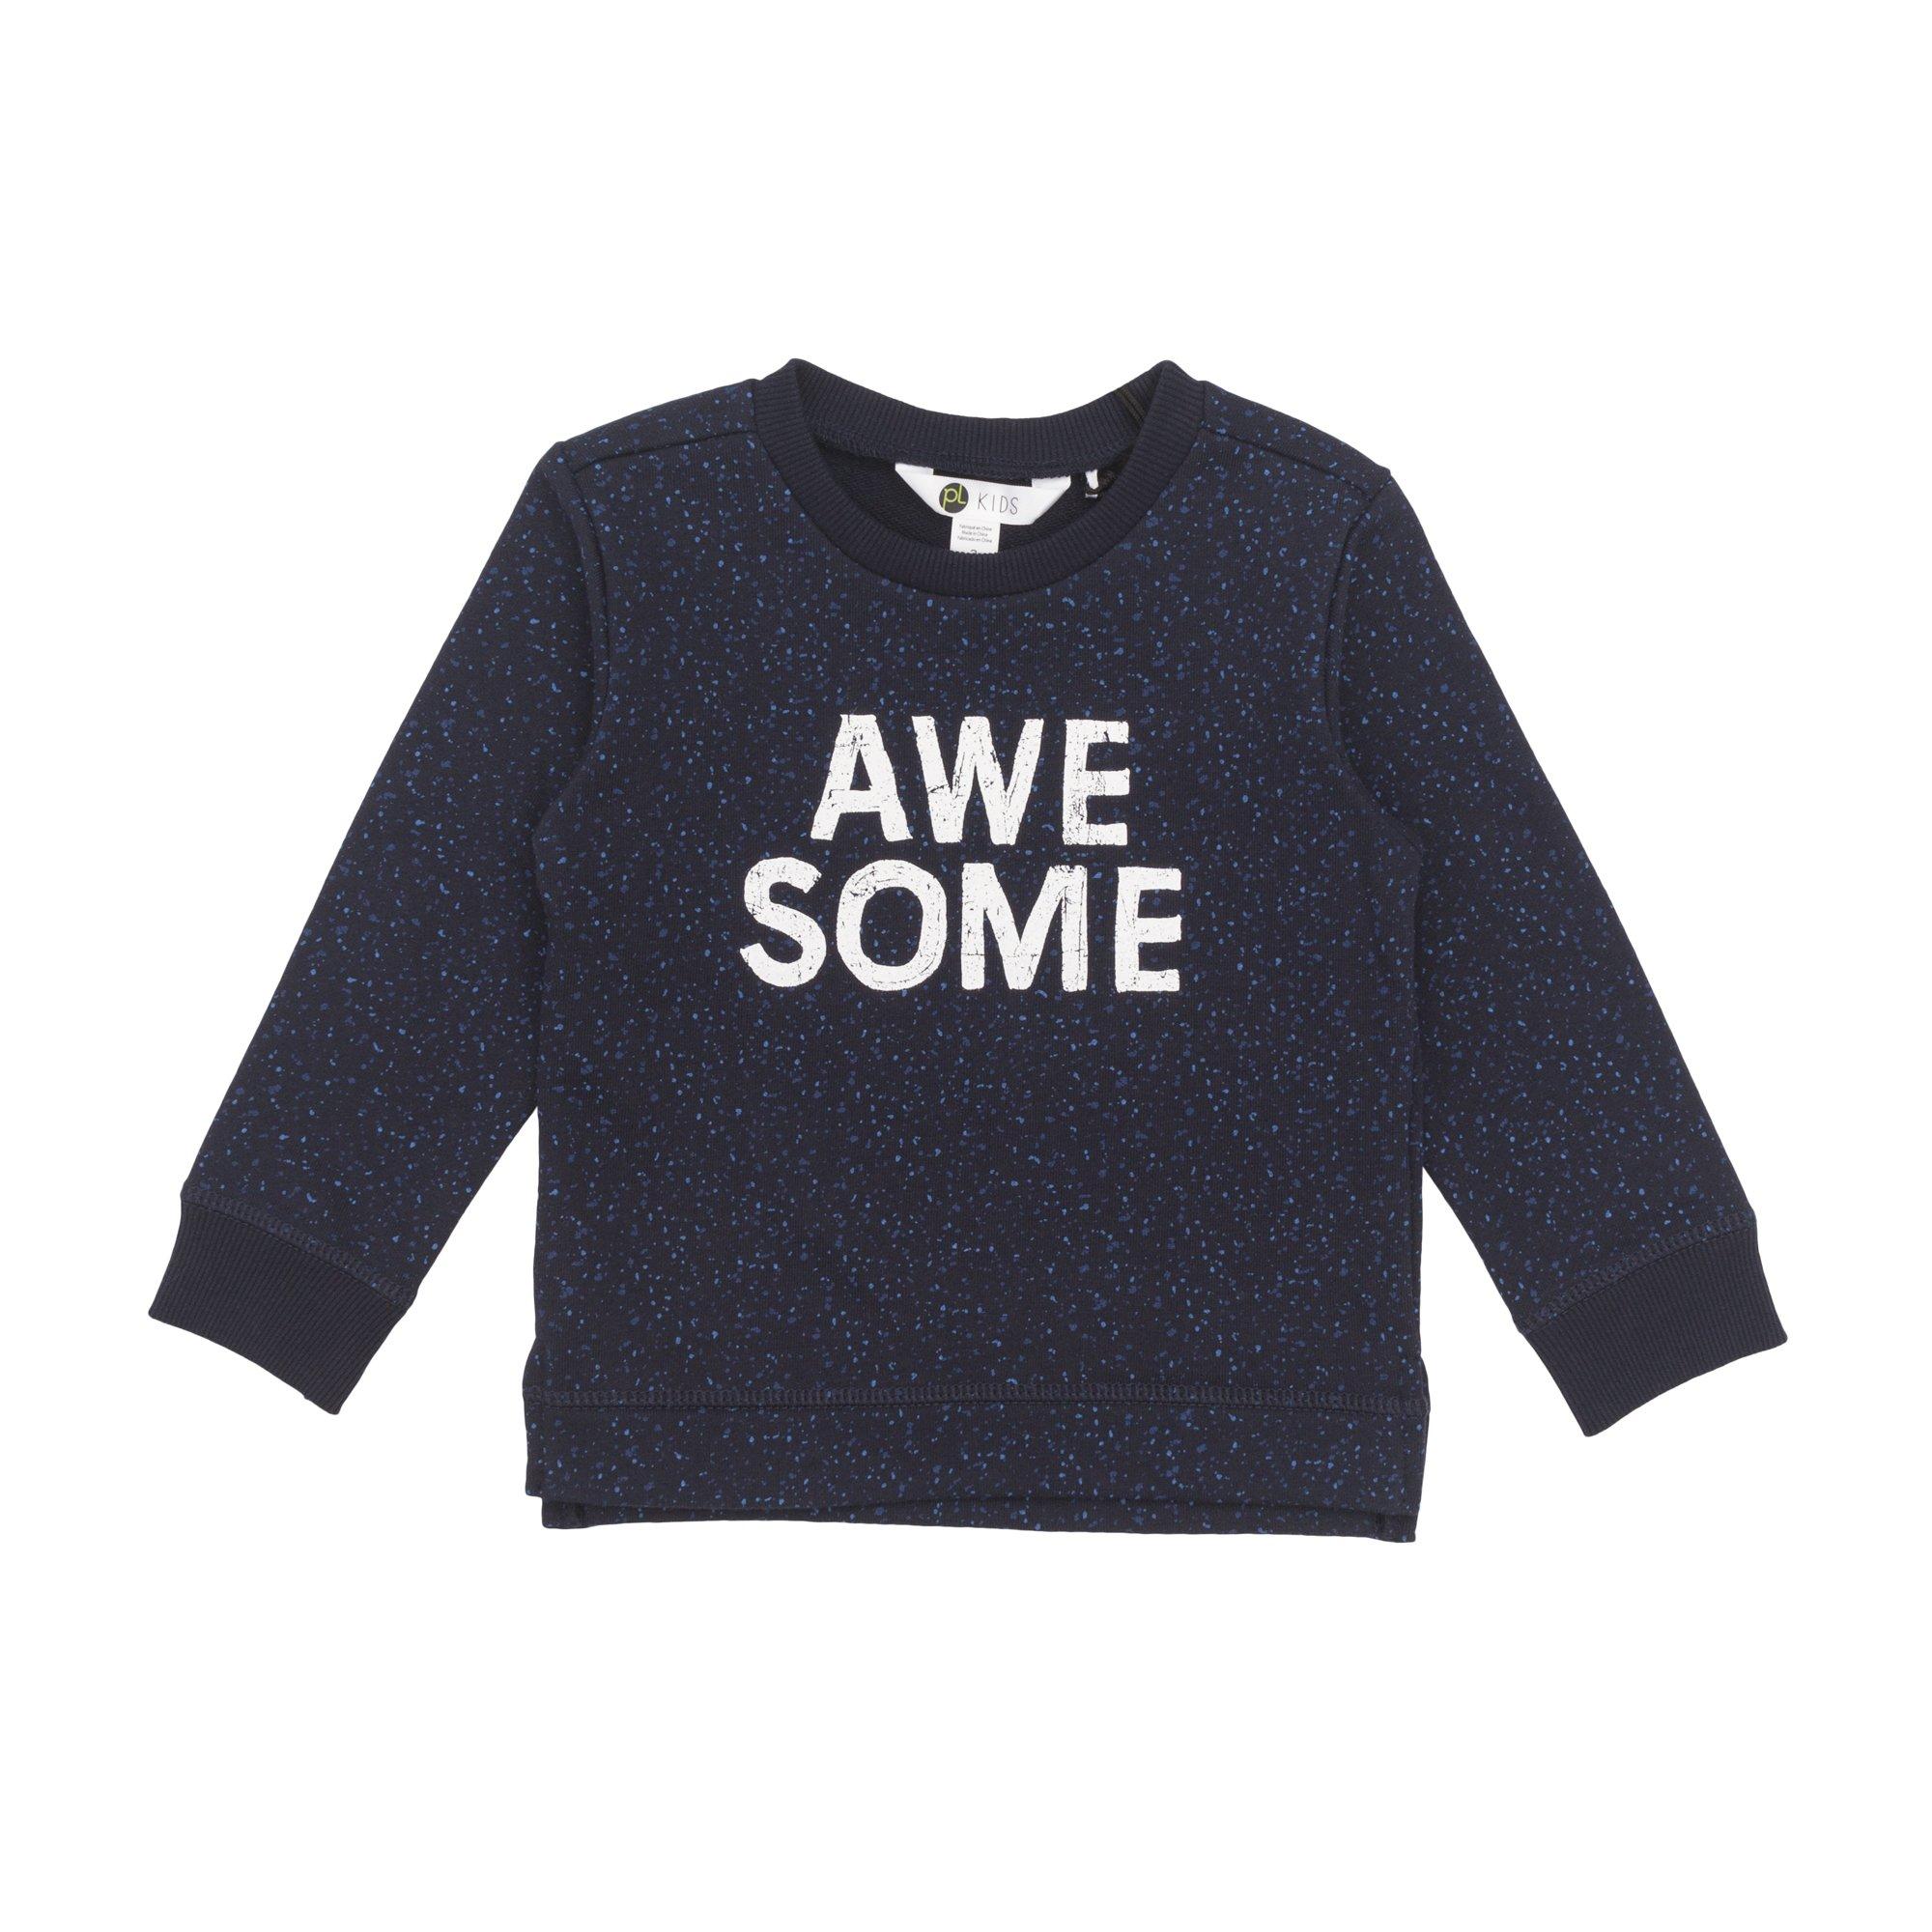 Petit Lem Big Boys' Sweater Top Comfortable and Stylish, Navy, 3